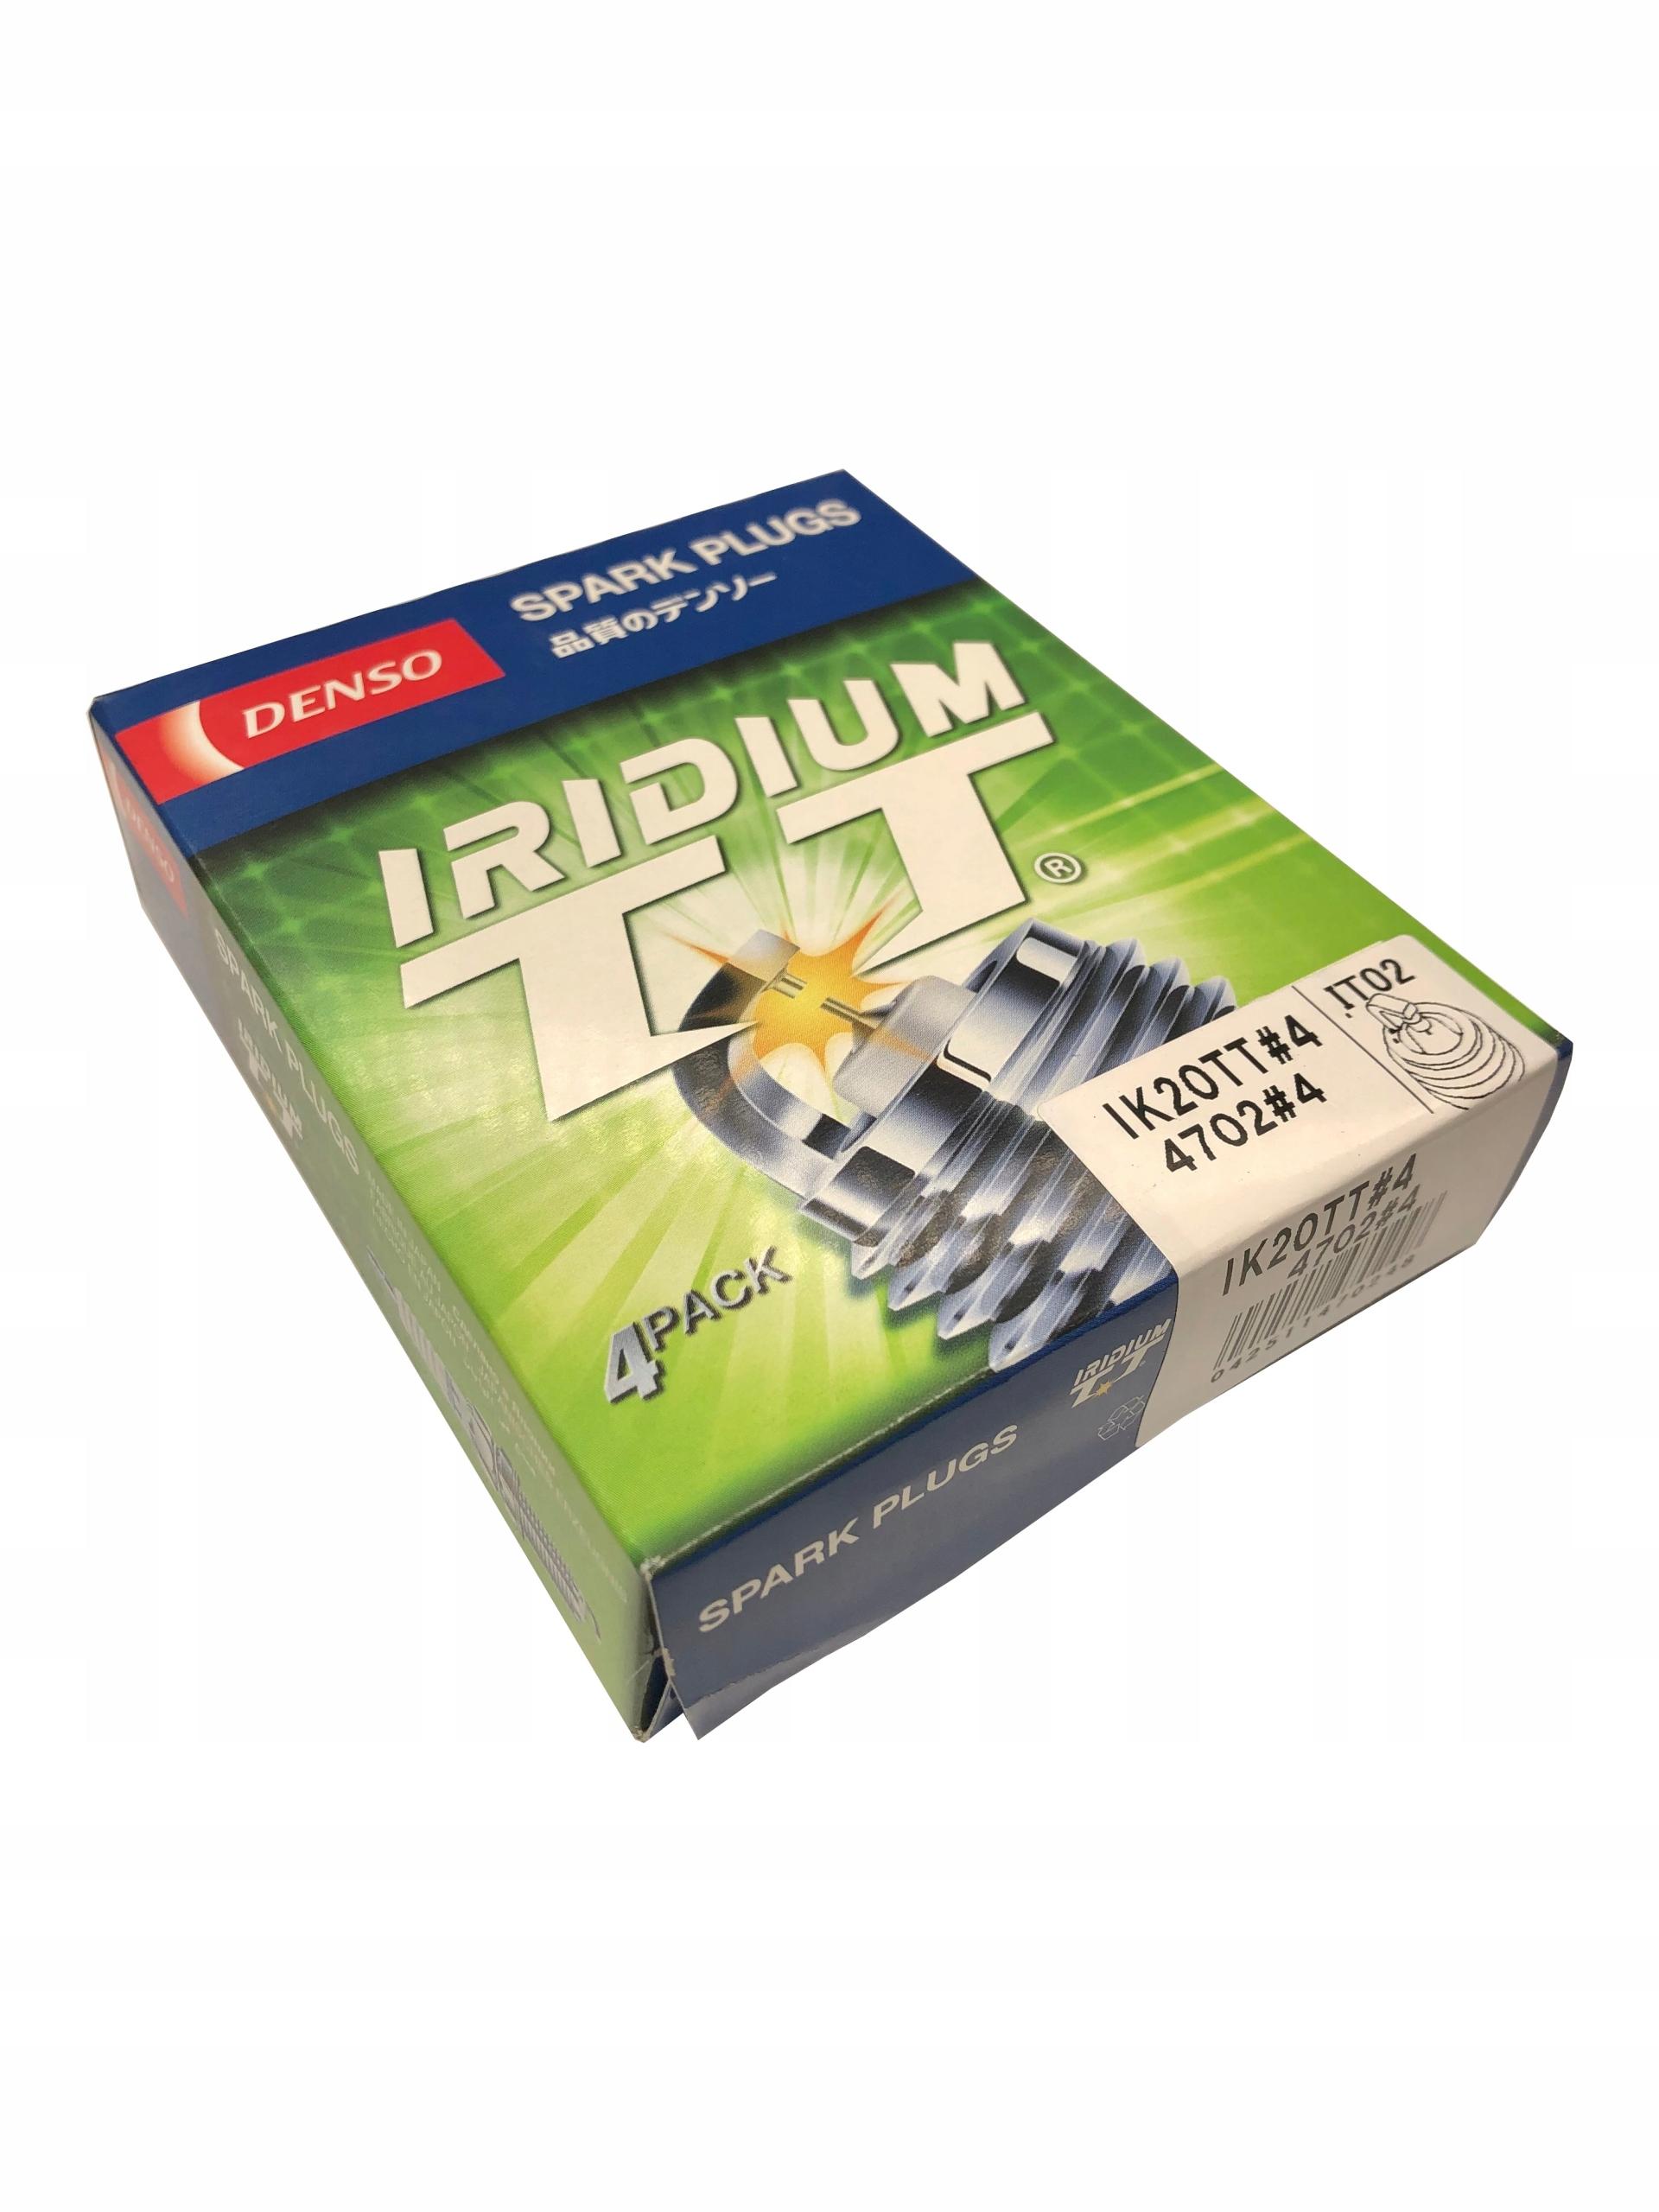 Свеча зажигания denso iridium ik20tt бензин снг